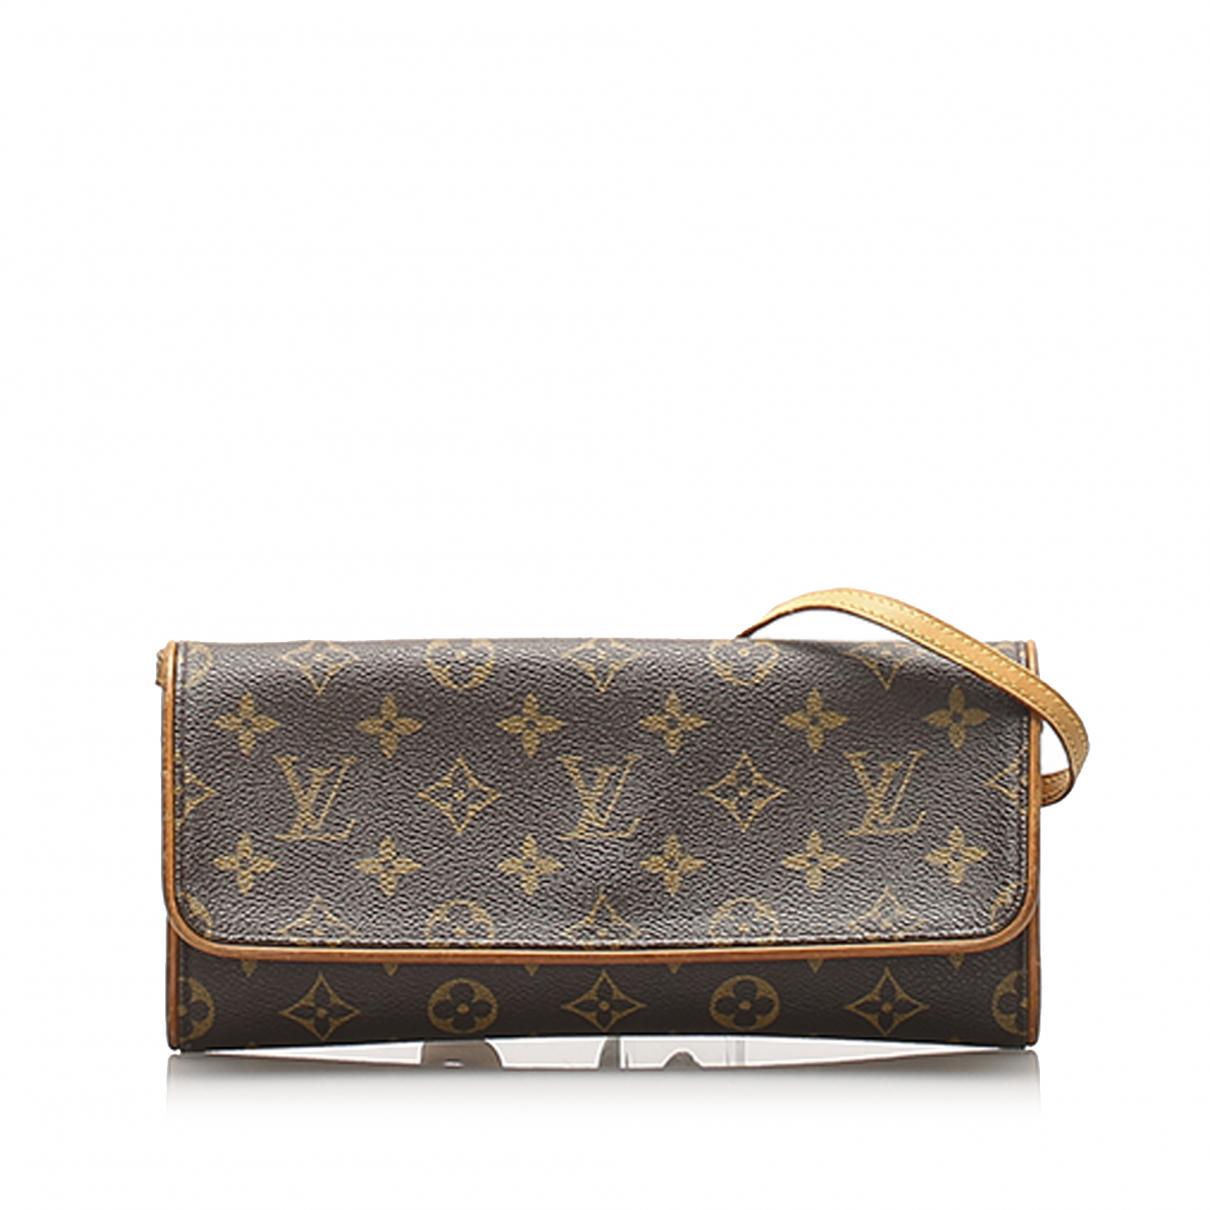 Bandolera Twin de Lona Louis Vuitton